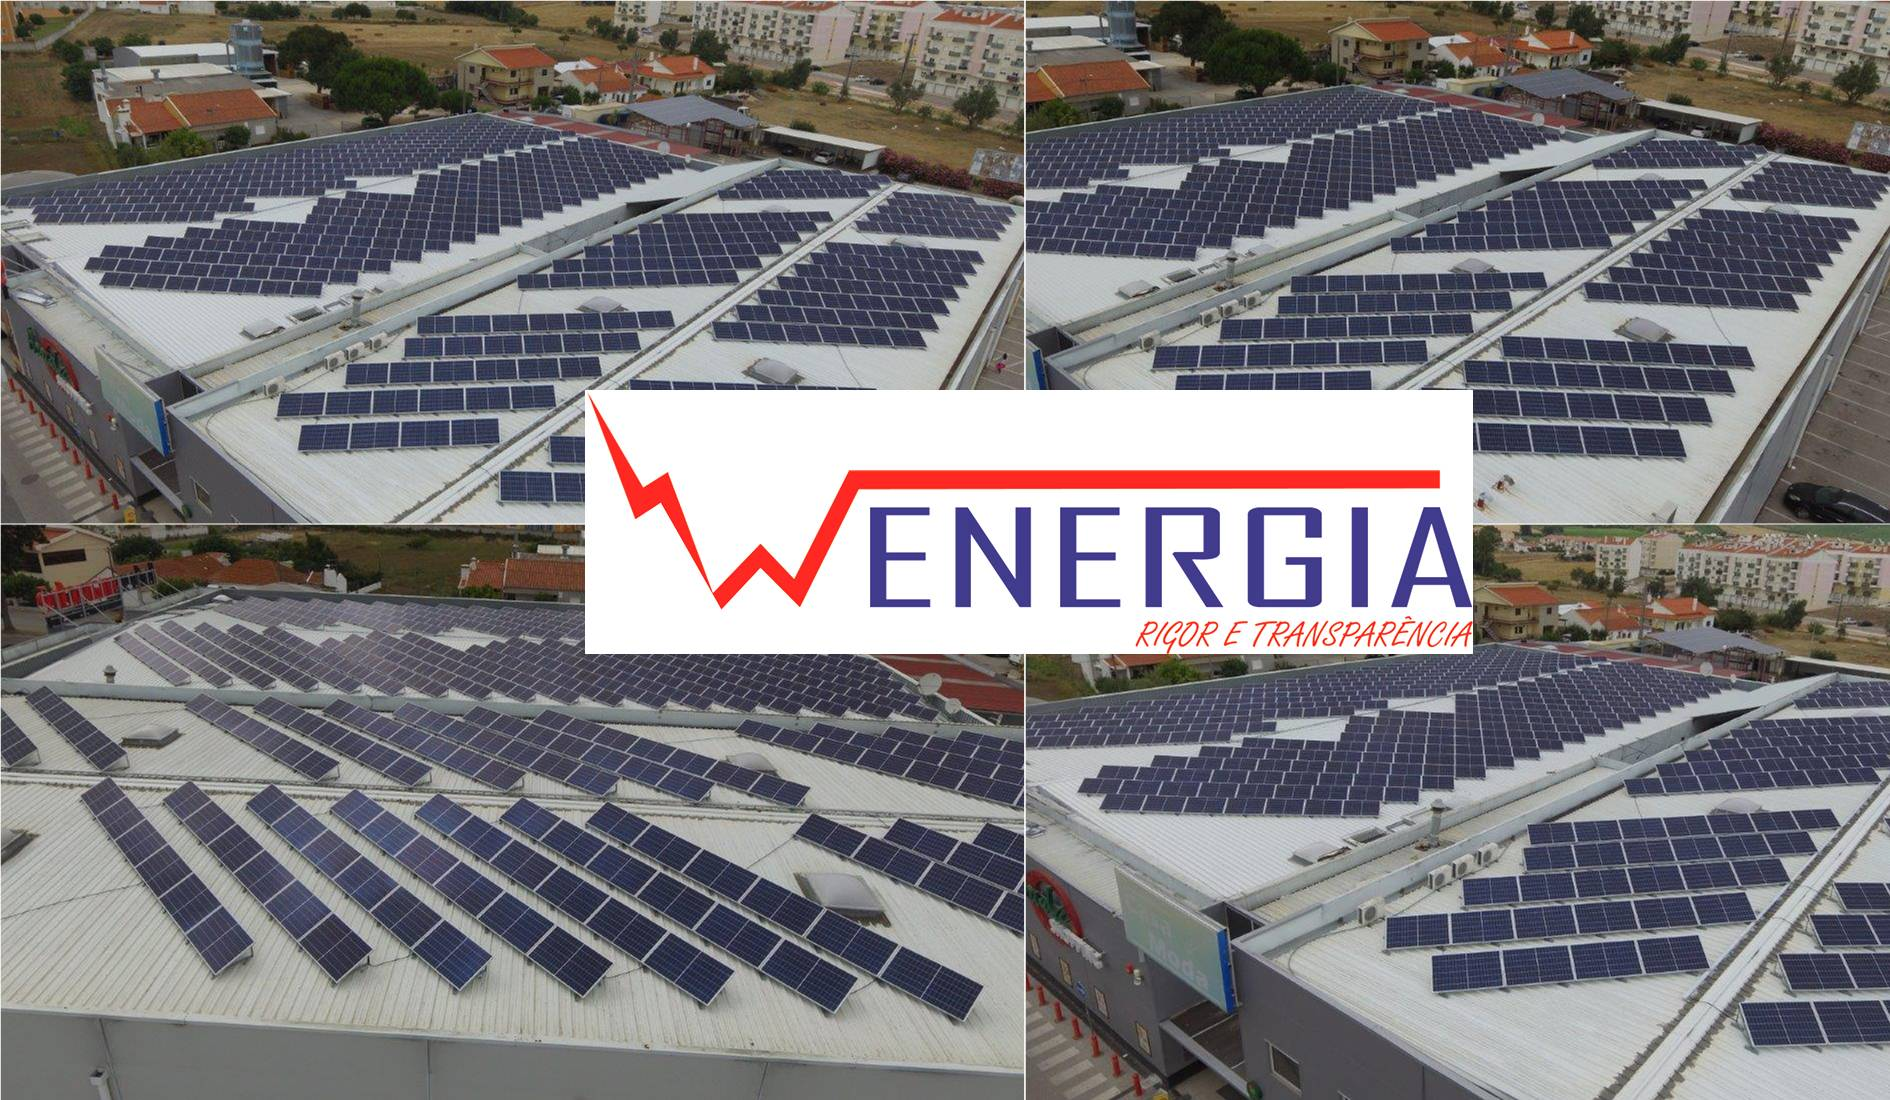 WENERGIA_UPAC 5